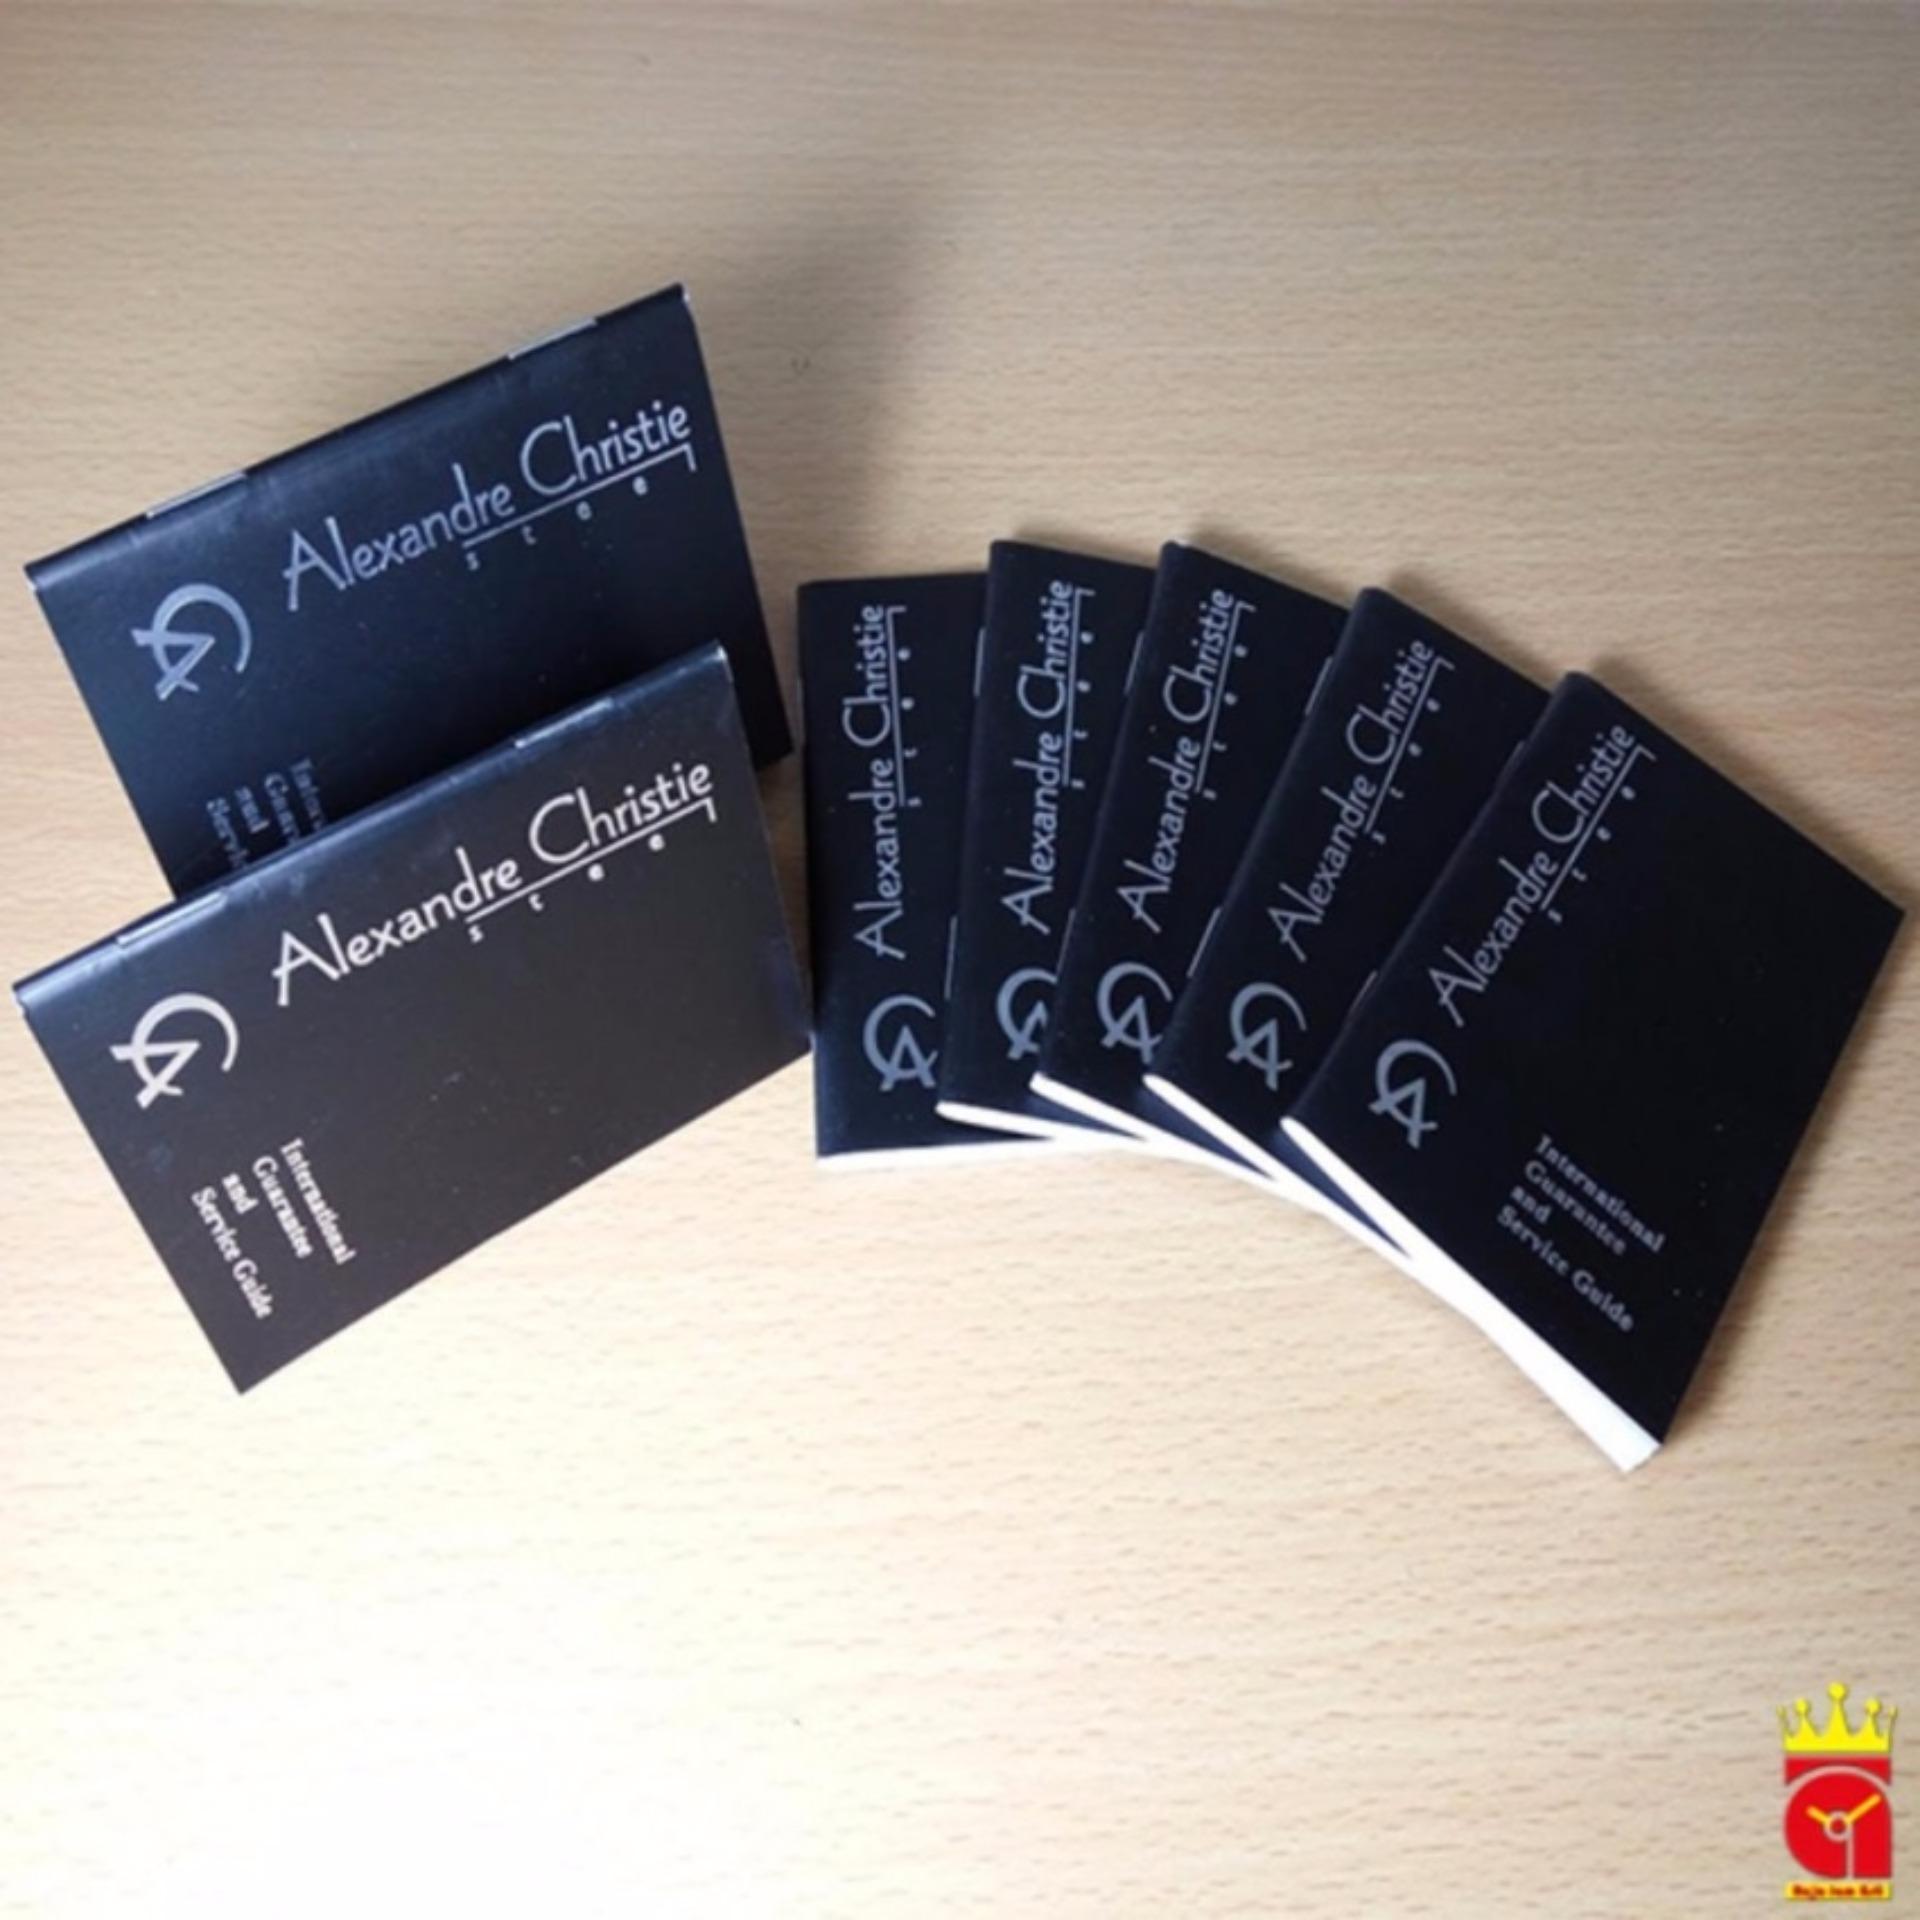 Alexandre Christie Woman Tranquility Jam Tangan Wanita Black Ac2510 Rosegold